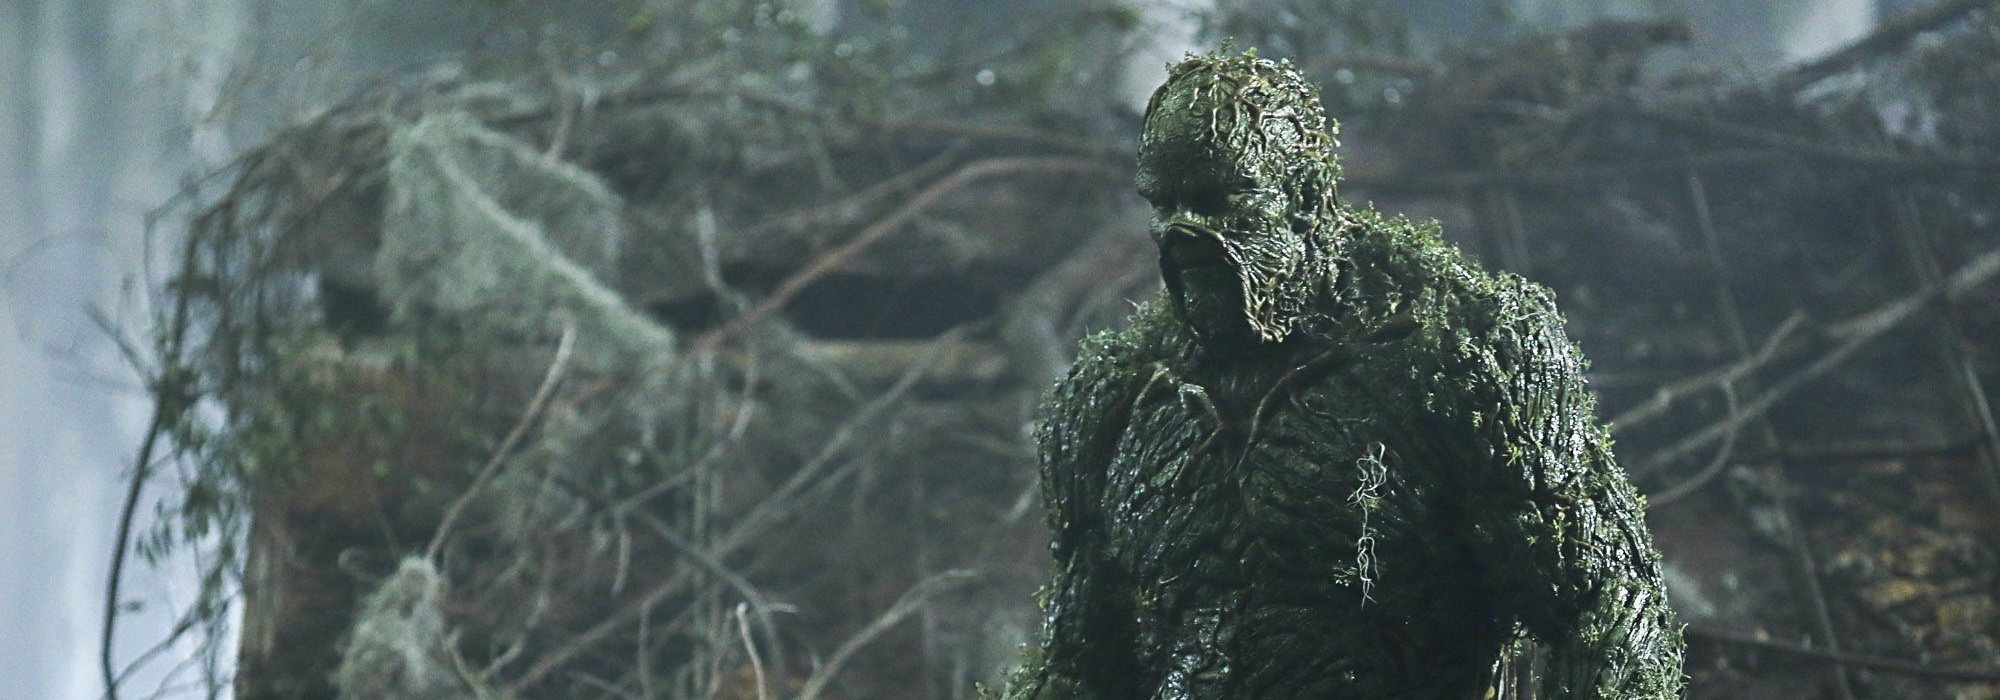 La serie de James Wan... ¿Swamp Thing revivirá en The CW?